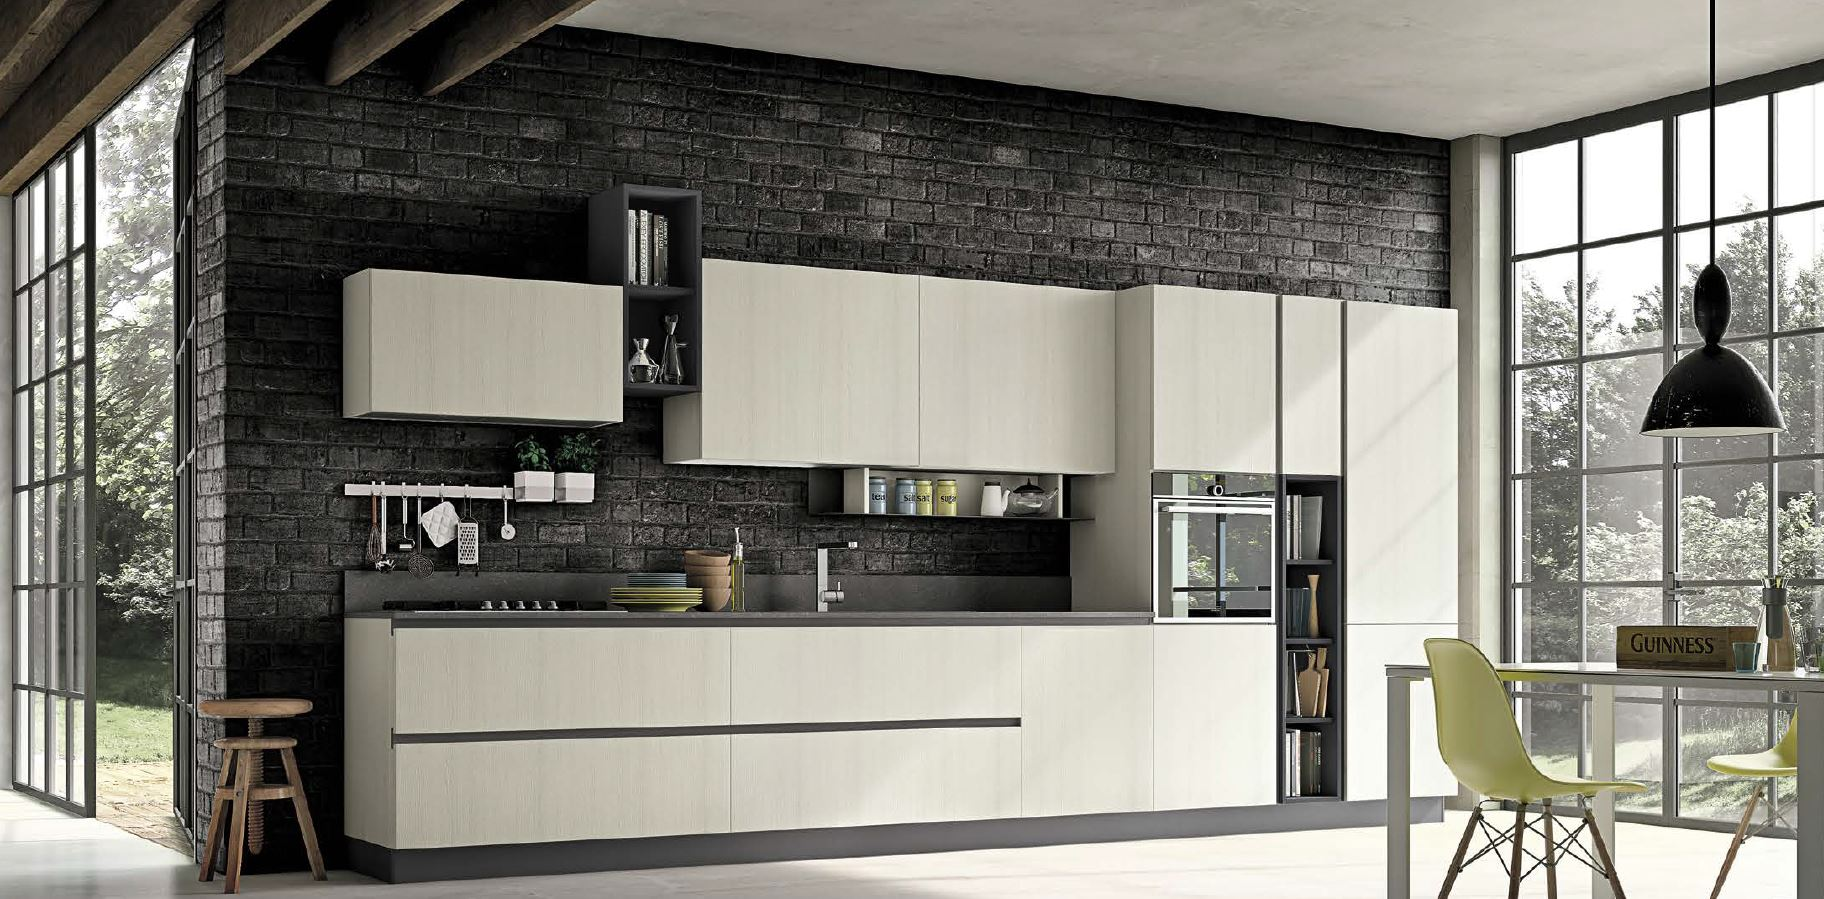 Cucine in stile moderno su misura tetesi arredamenti for Arredamenti da interni moderni